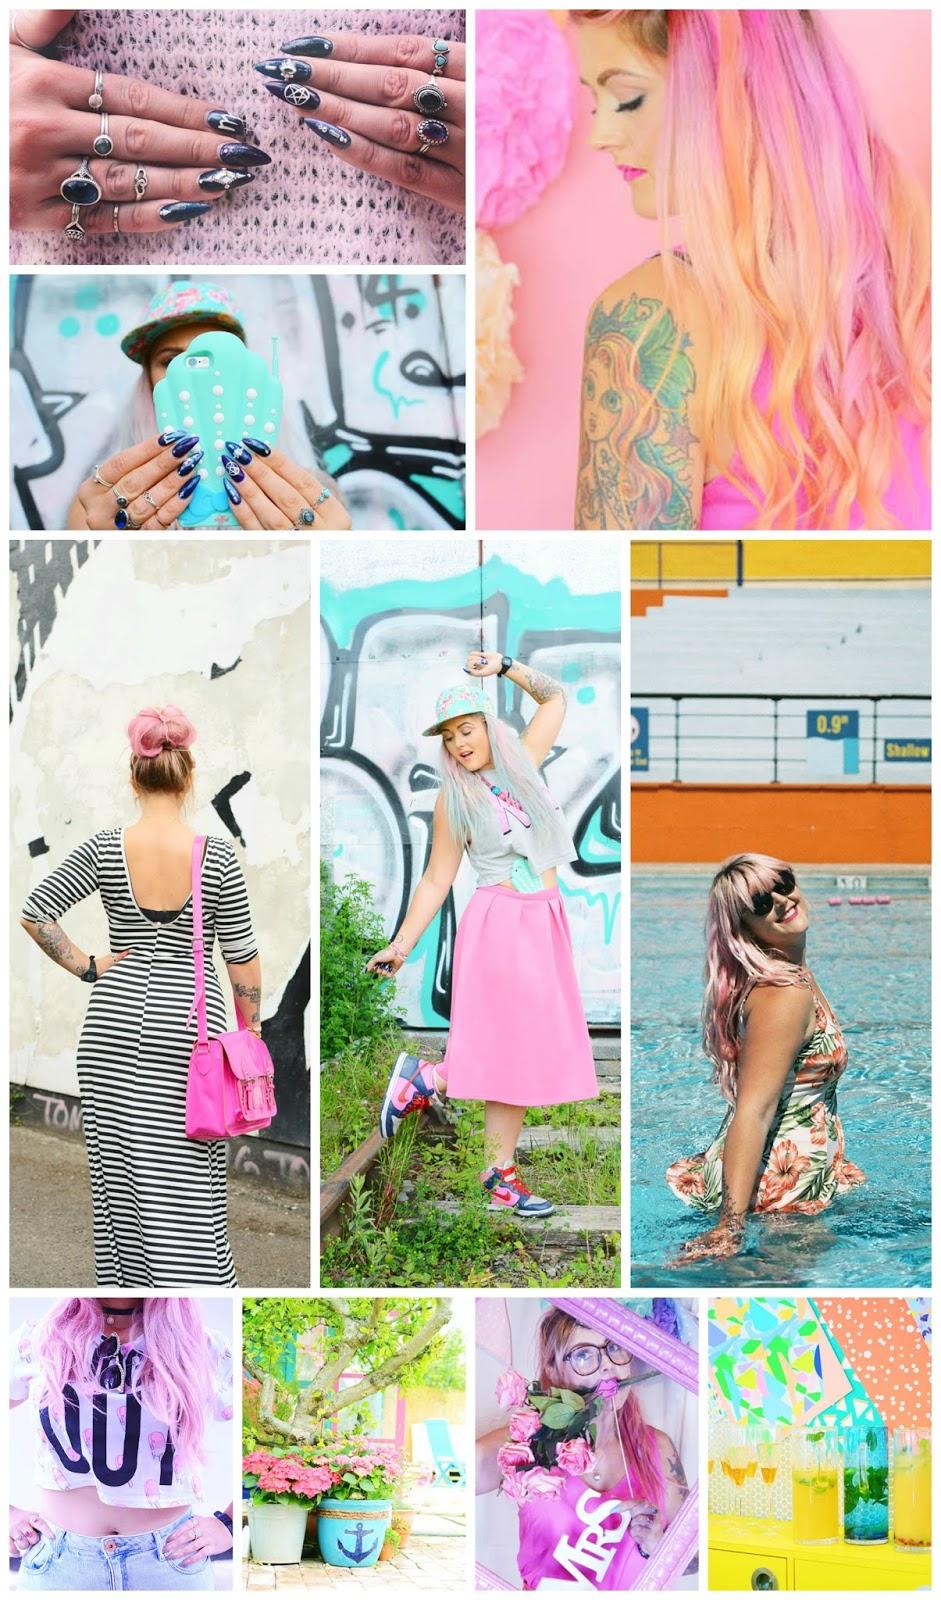 favourite blogger, style blogger, colourful blogger, pink hair, Mermaid Gossip, Bristol blogger